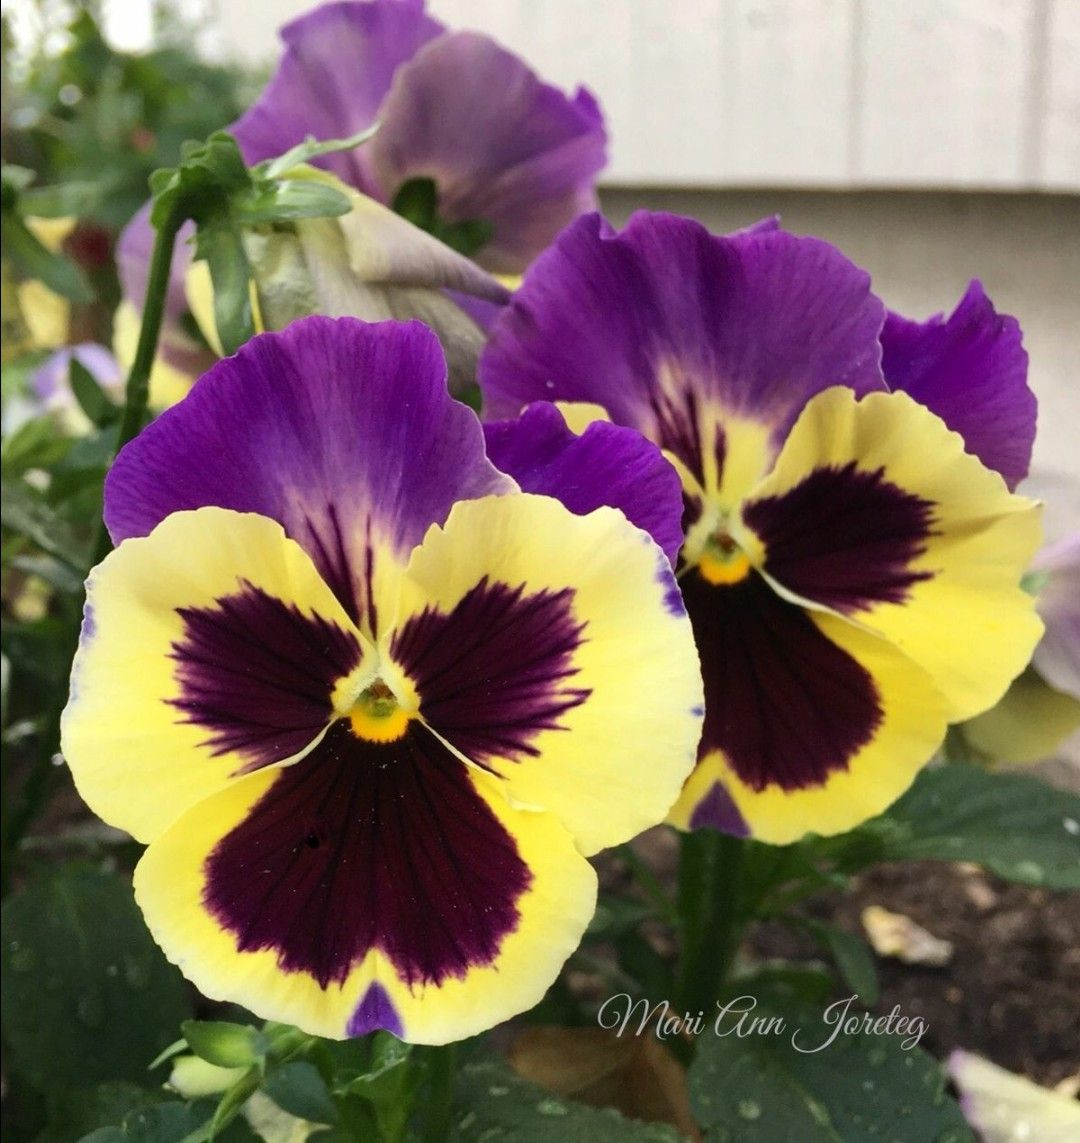 Pin By Umran Oztepe On Zambaklar Pansies Flowers Fancy Flowers Pansies